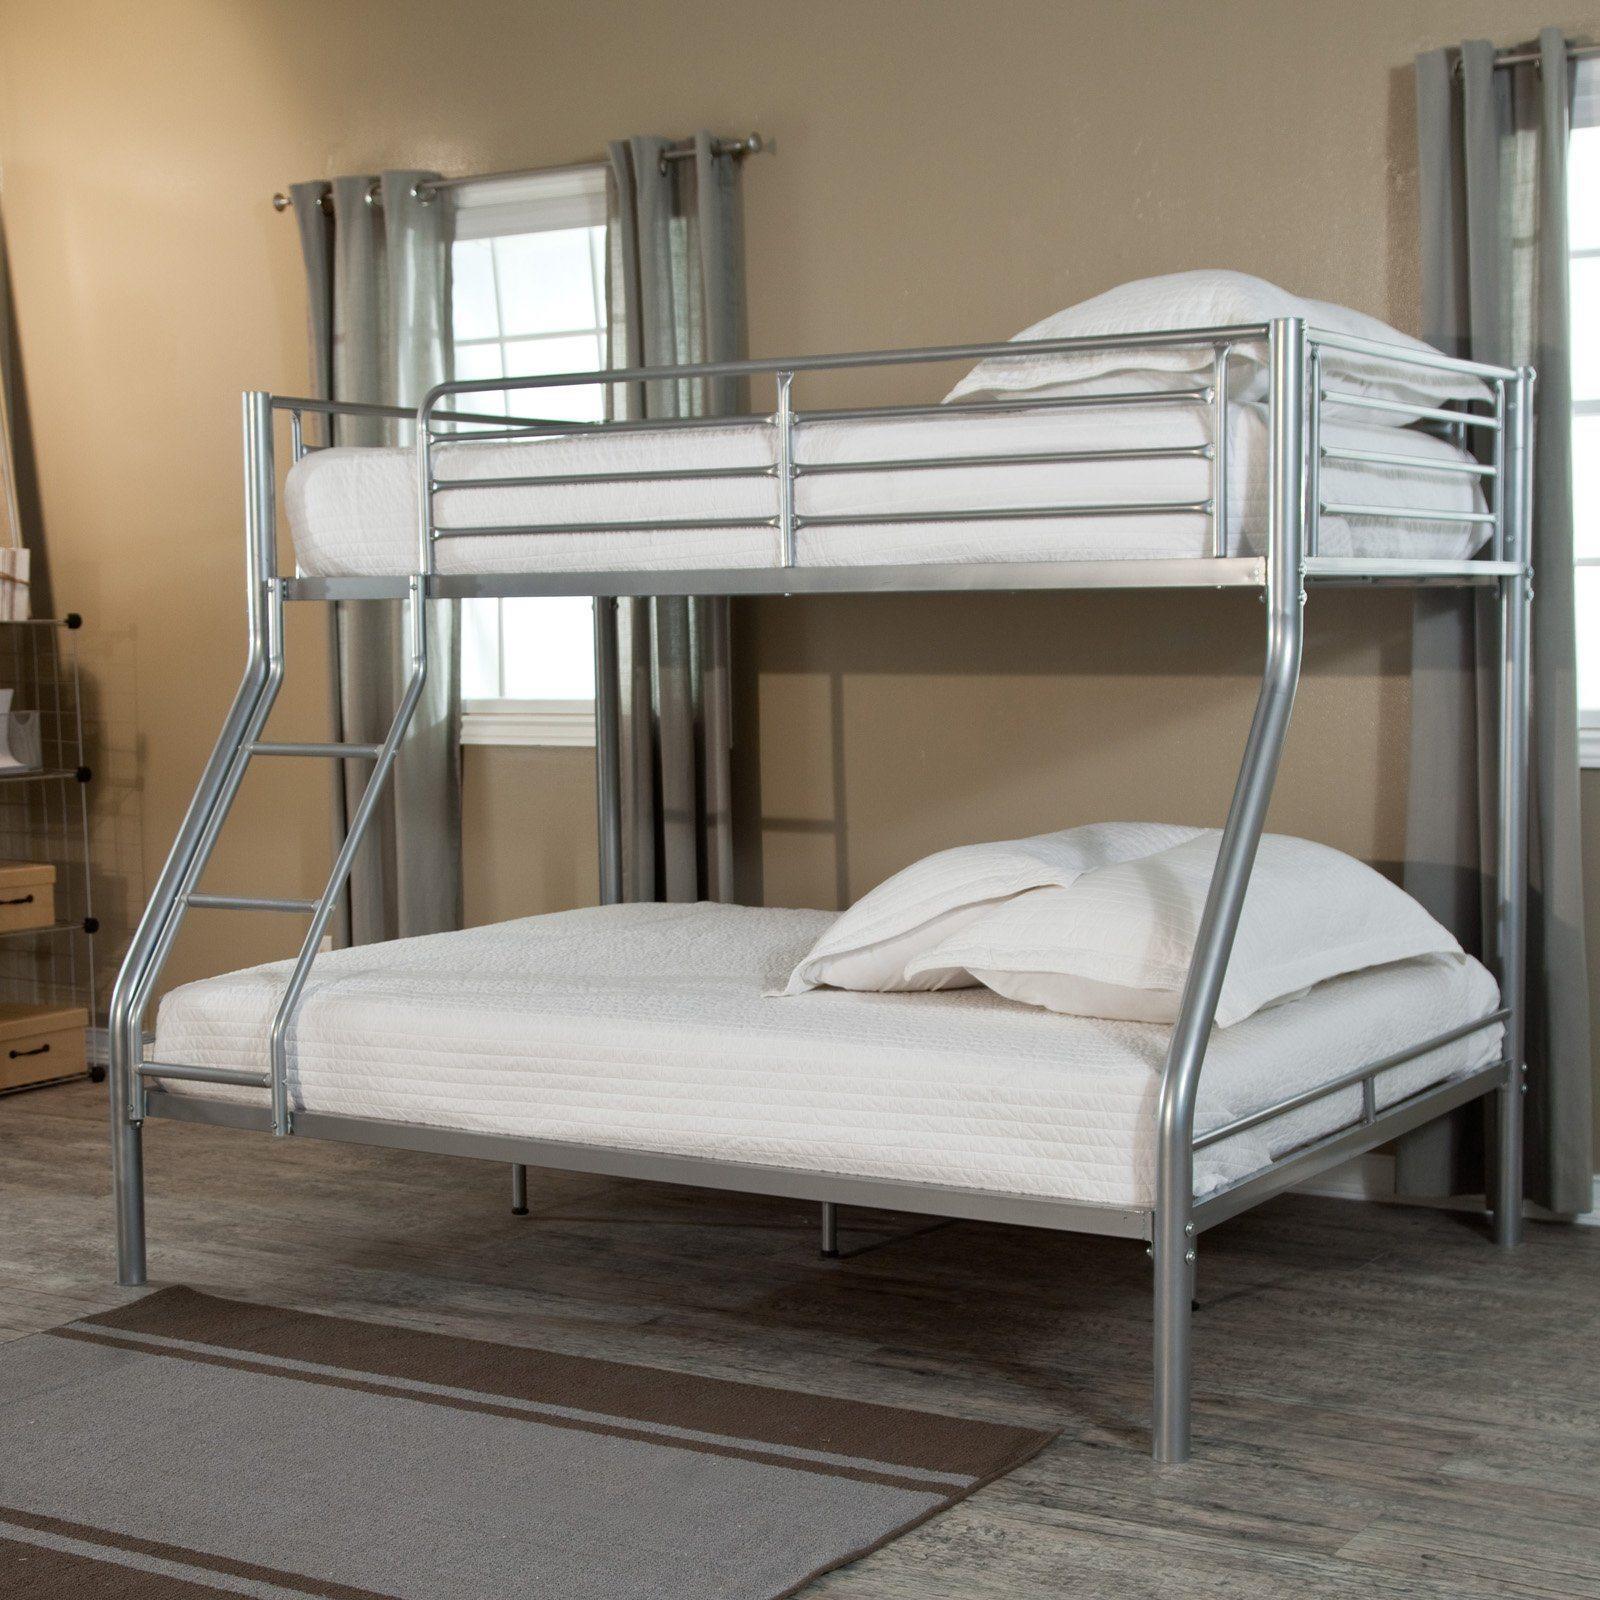 Bunk Beds : Big Lots Bedroom Sets Bunk Bed Mattress Size Kmart Pertaining To Kmart Bunk Bed Mattress (Image 2 of 20)